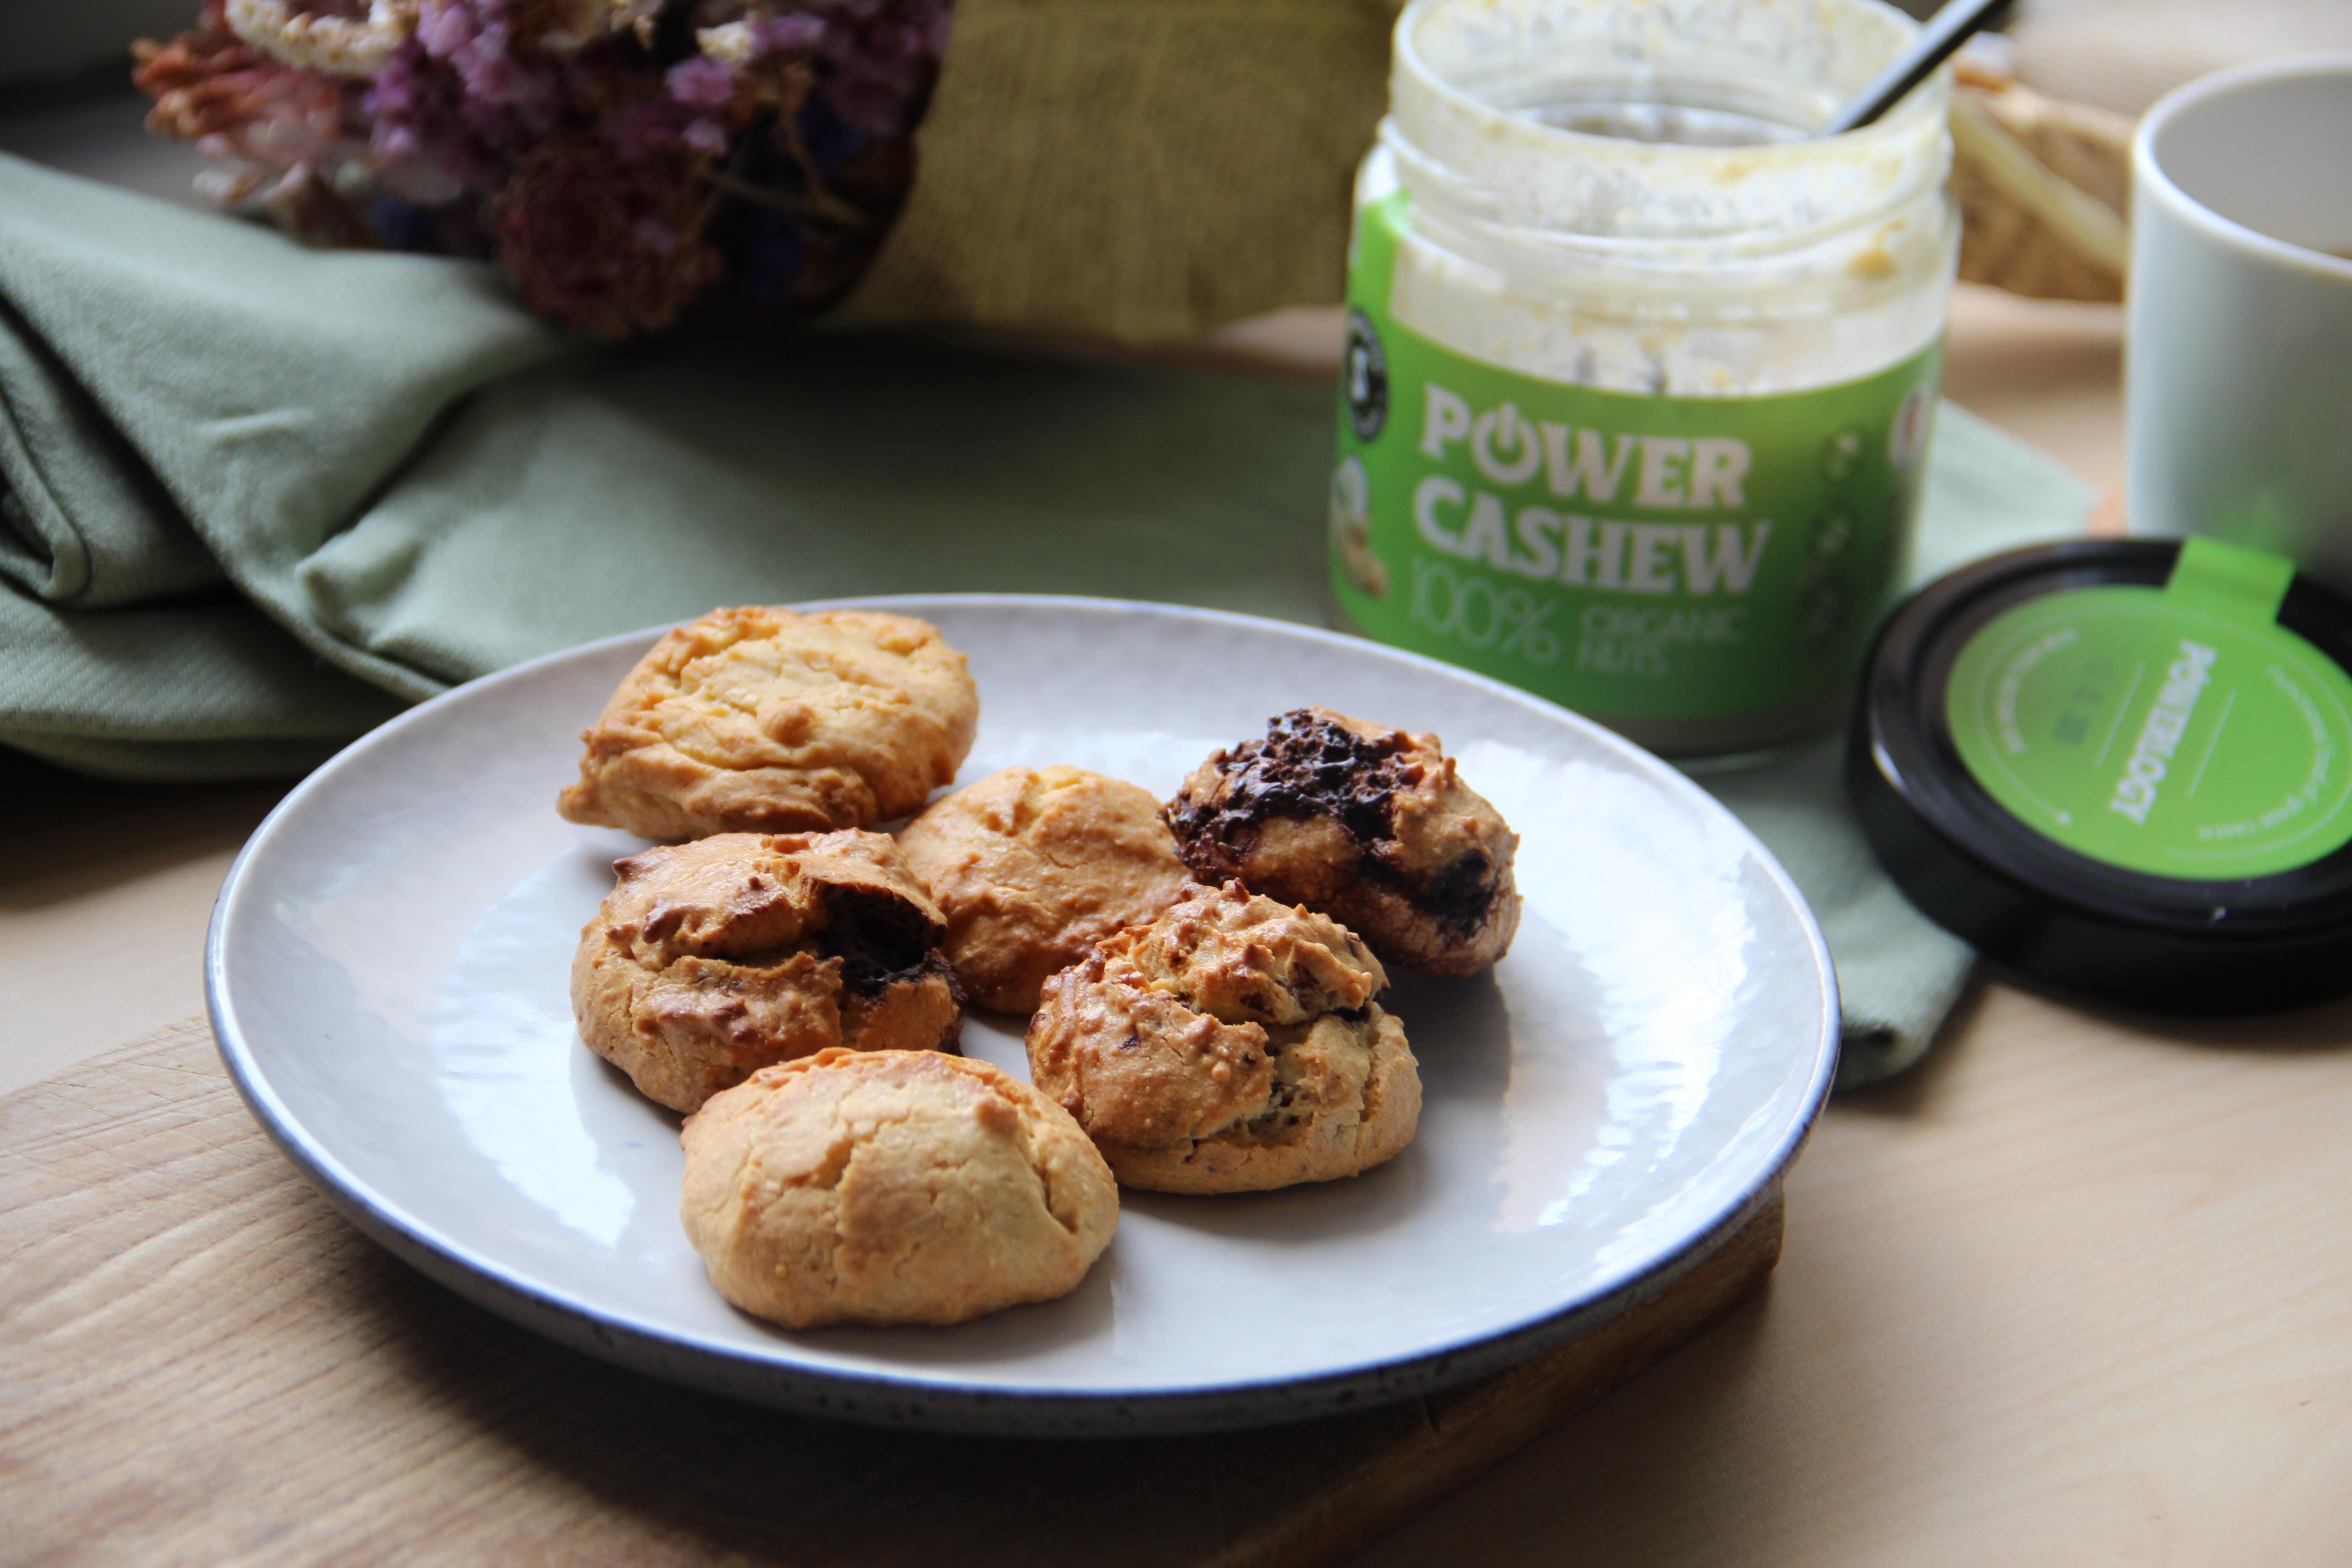 Jednoduché cookies bez cukru z orechového masla